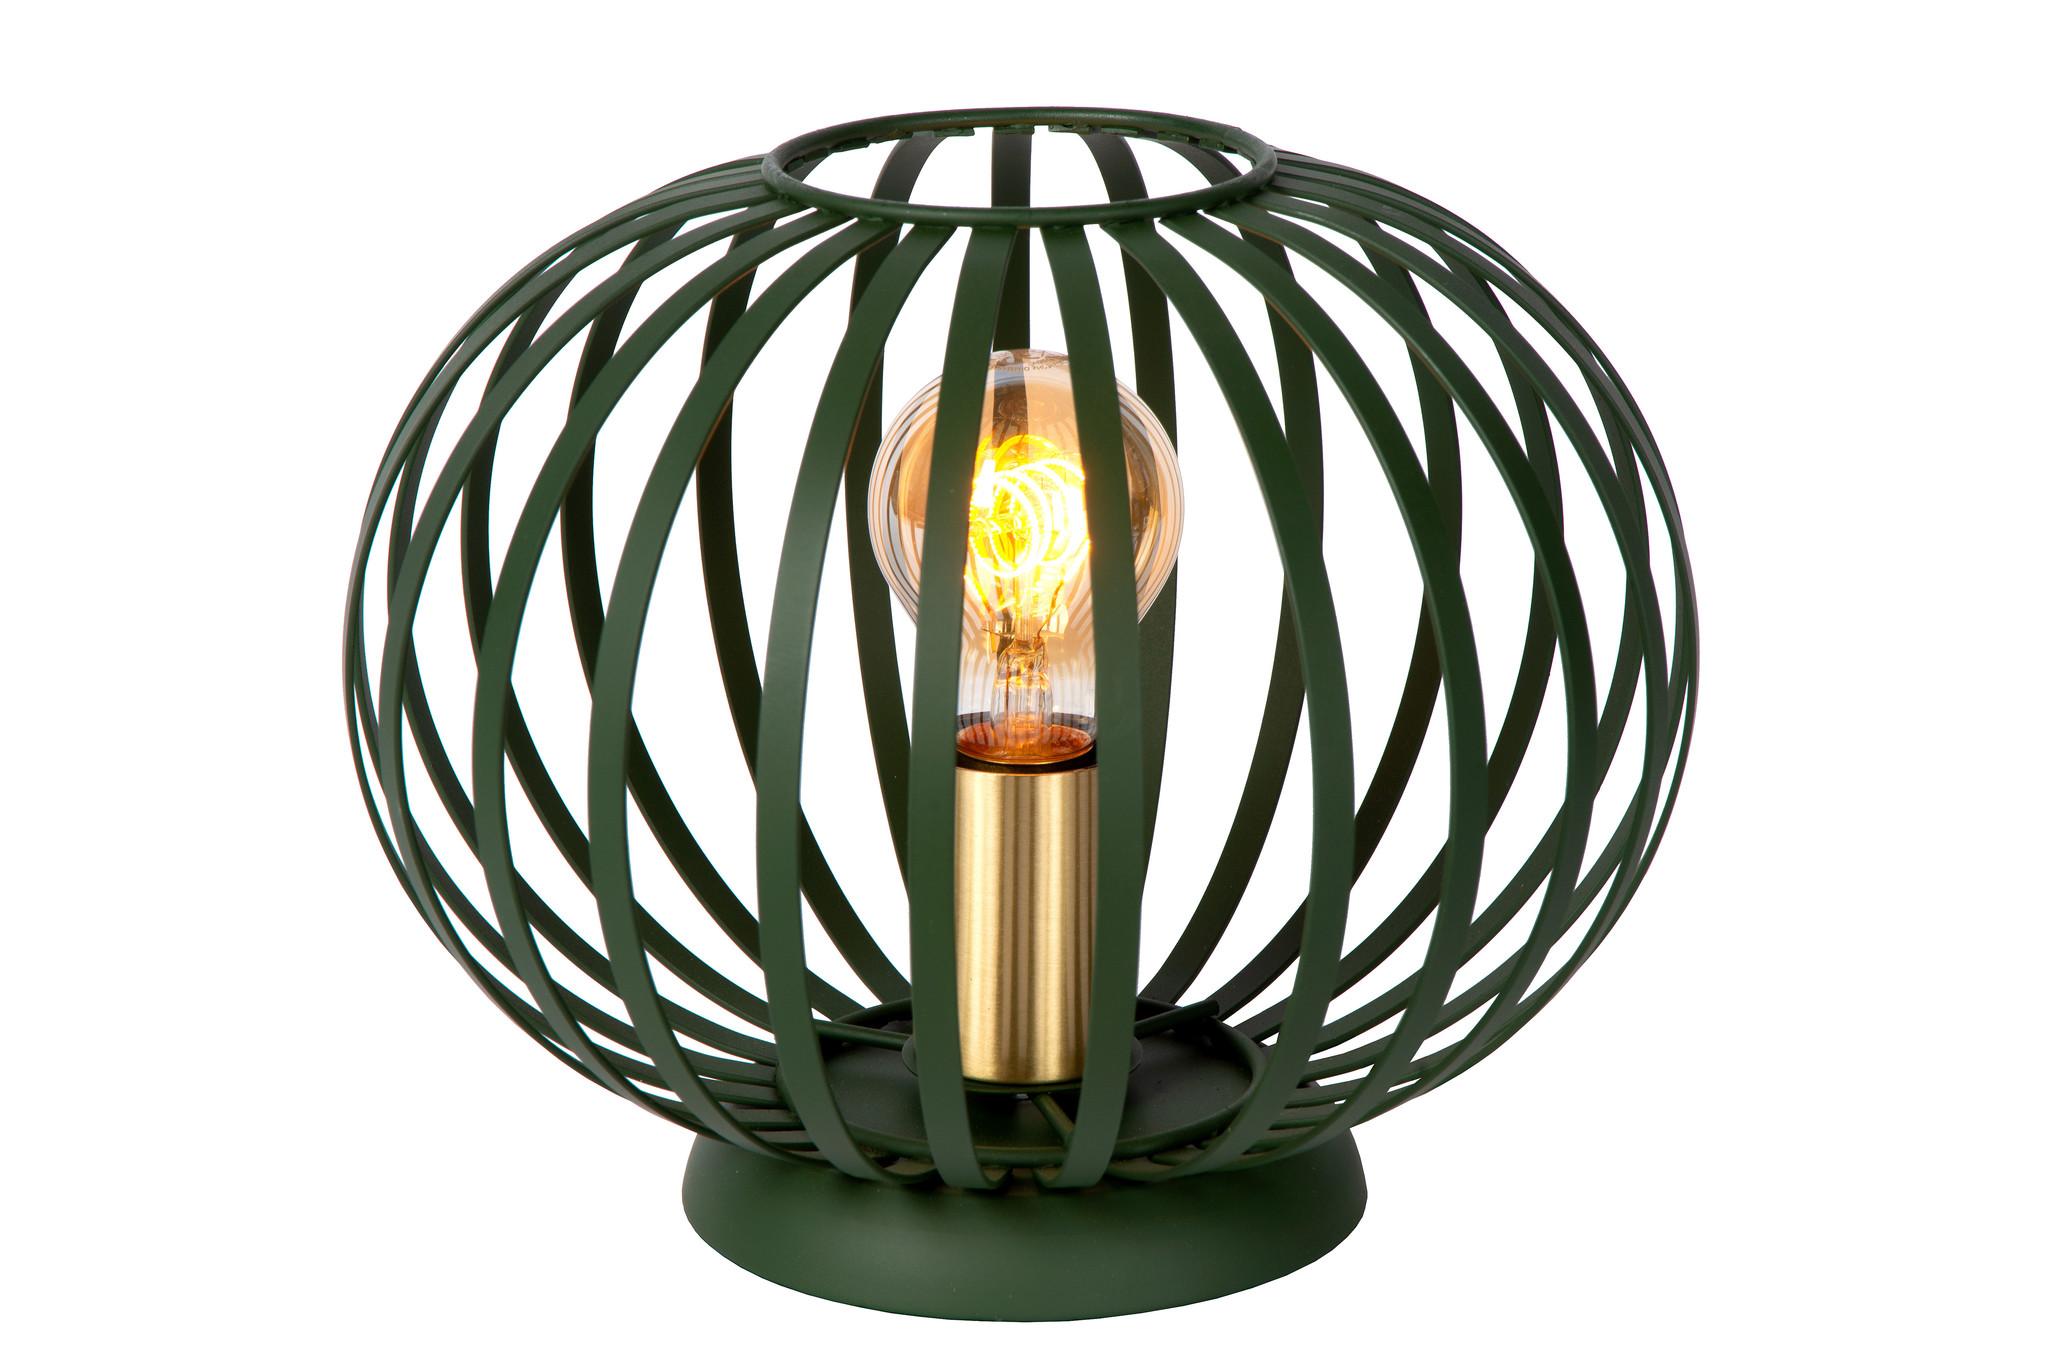 Lucide MANUELA Tafellamp-Groen-Ø25,5-1xE27-40W-Metaal